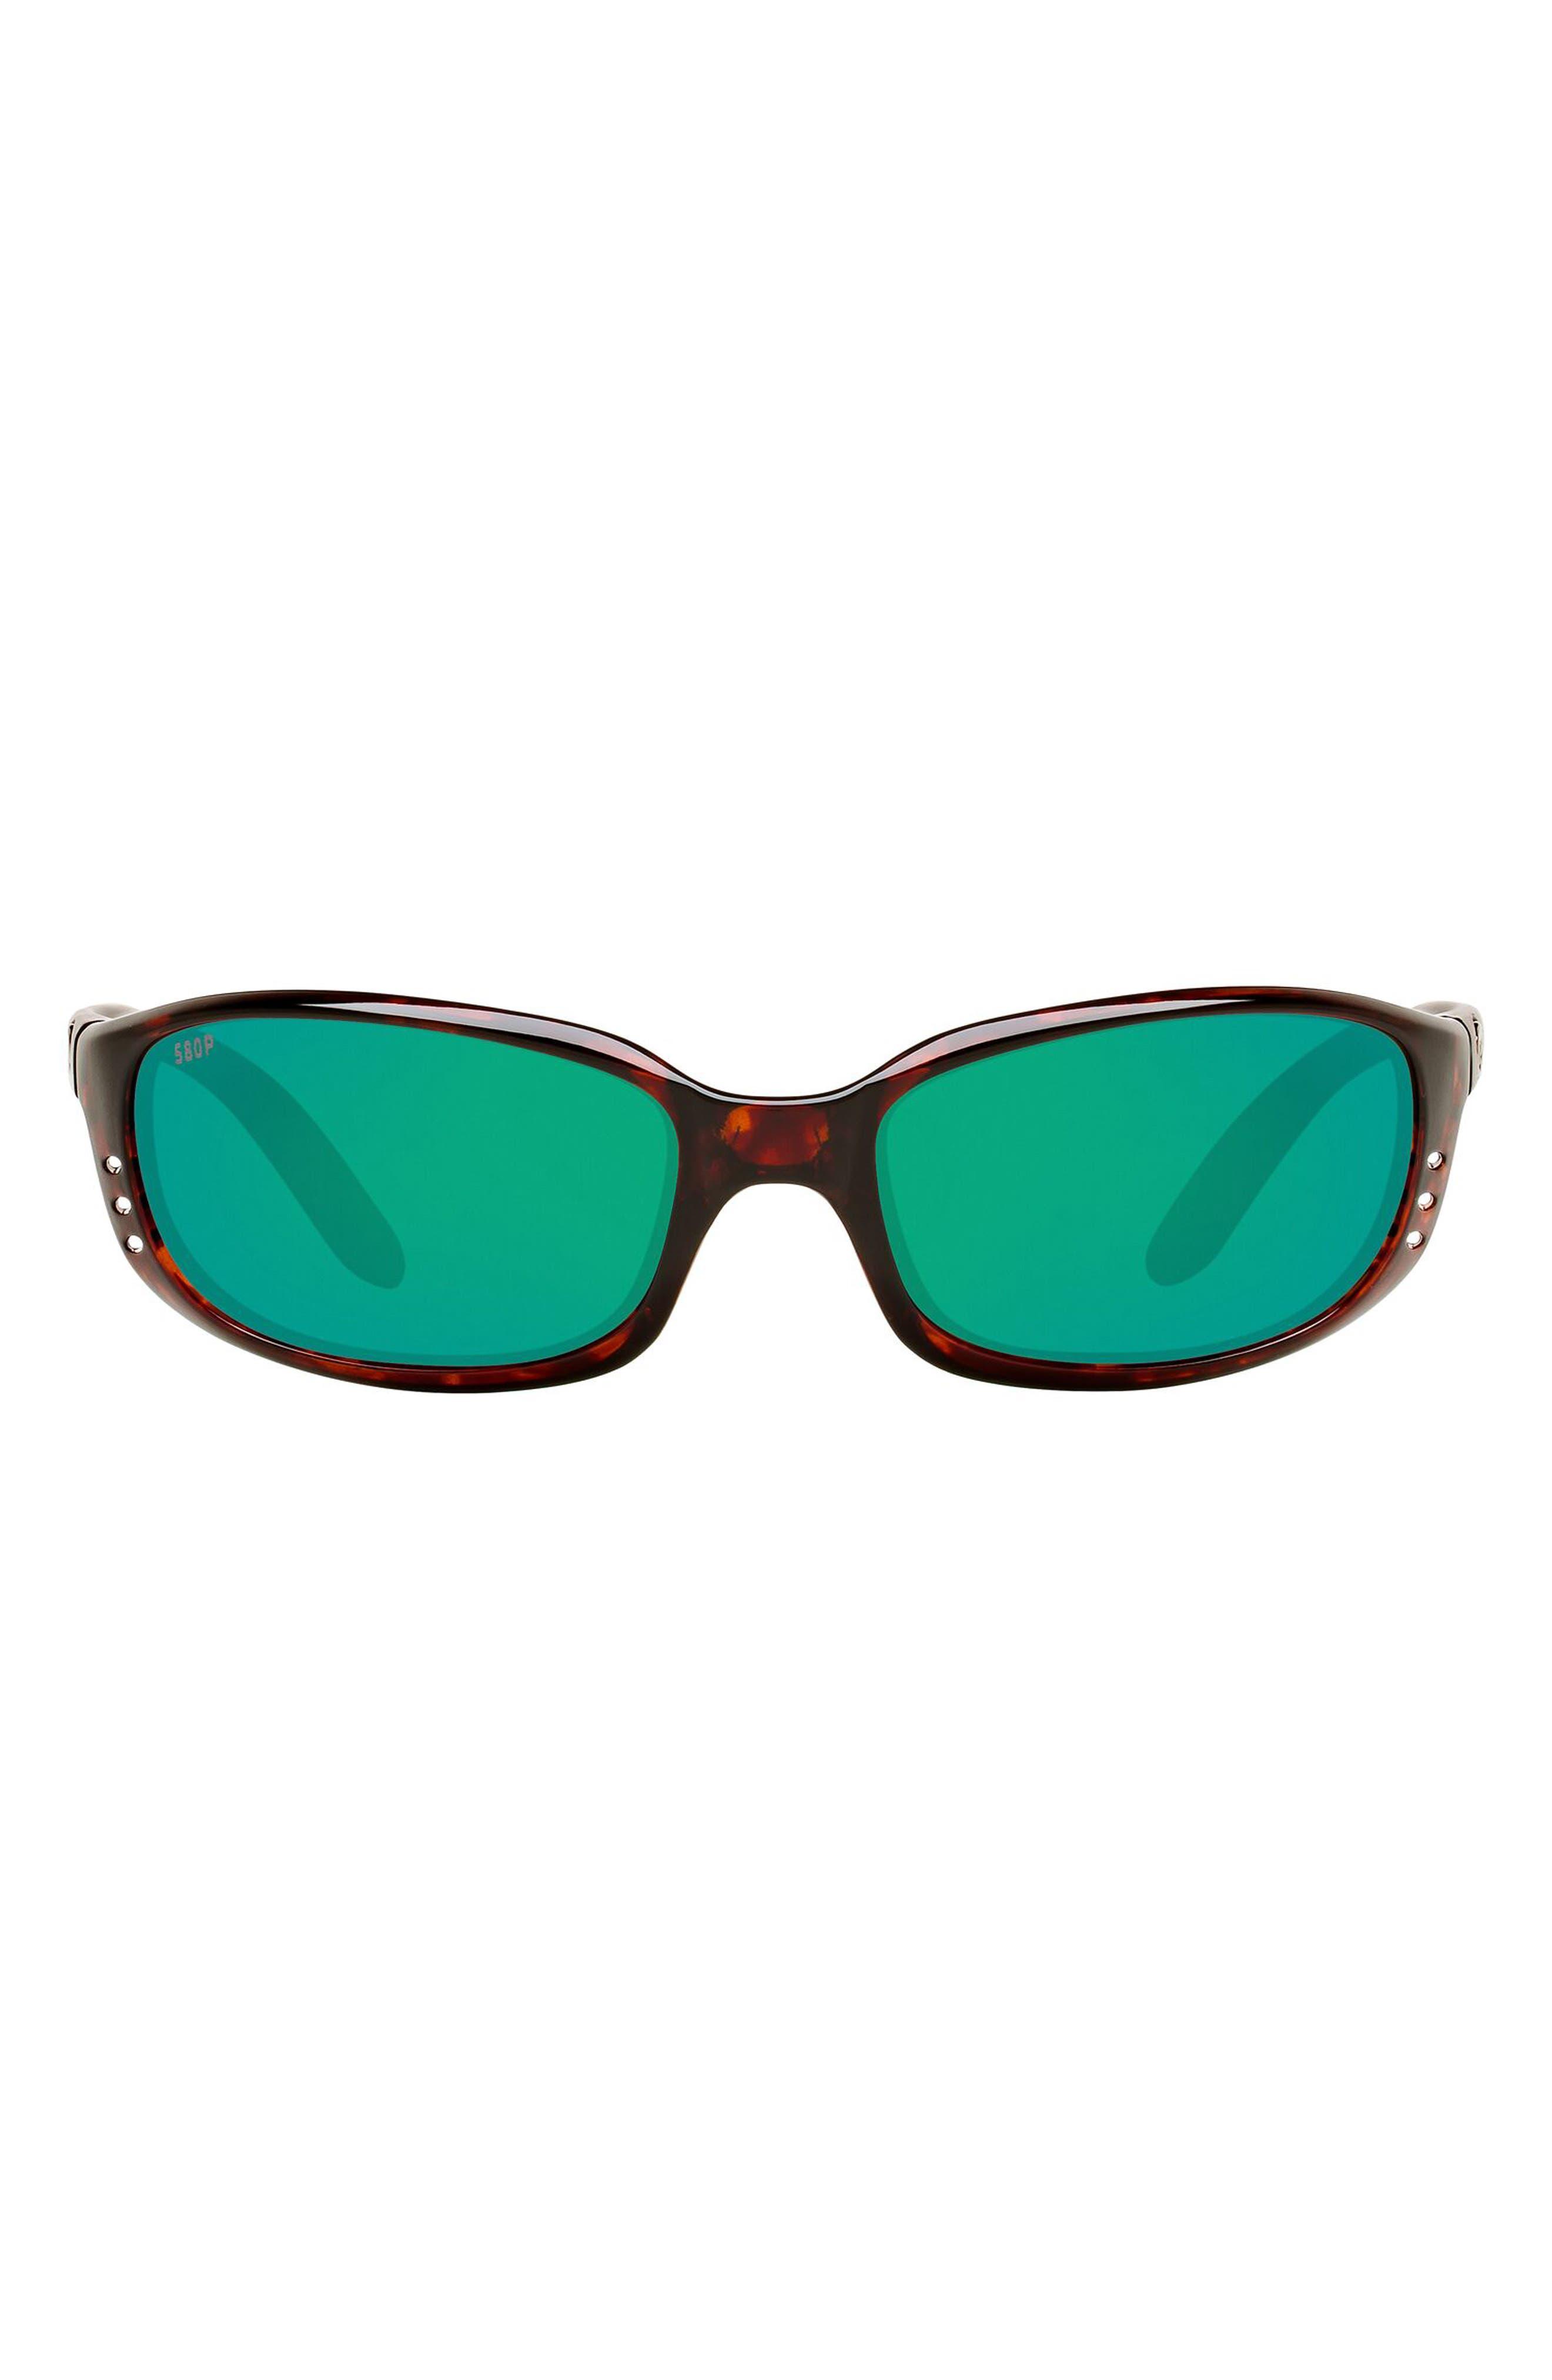 Brine 59mm Mirrored Polarized Oval Sunglasses